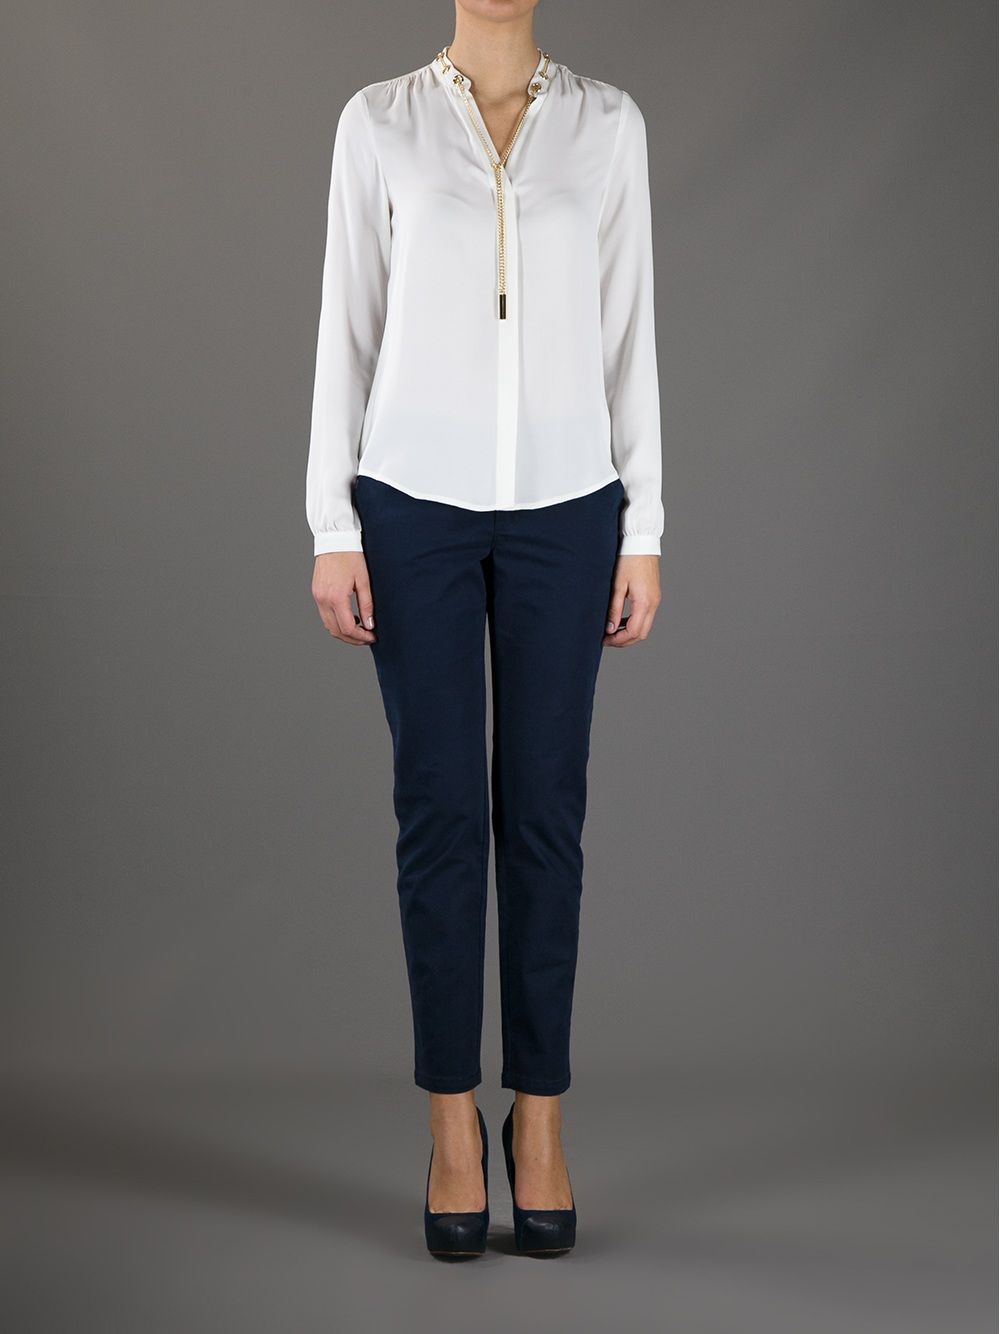 michael michael kors silk blouse in white lyst. Black Bedroom Furniture Sets. Home Design Ideas